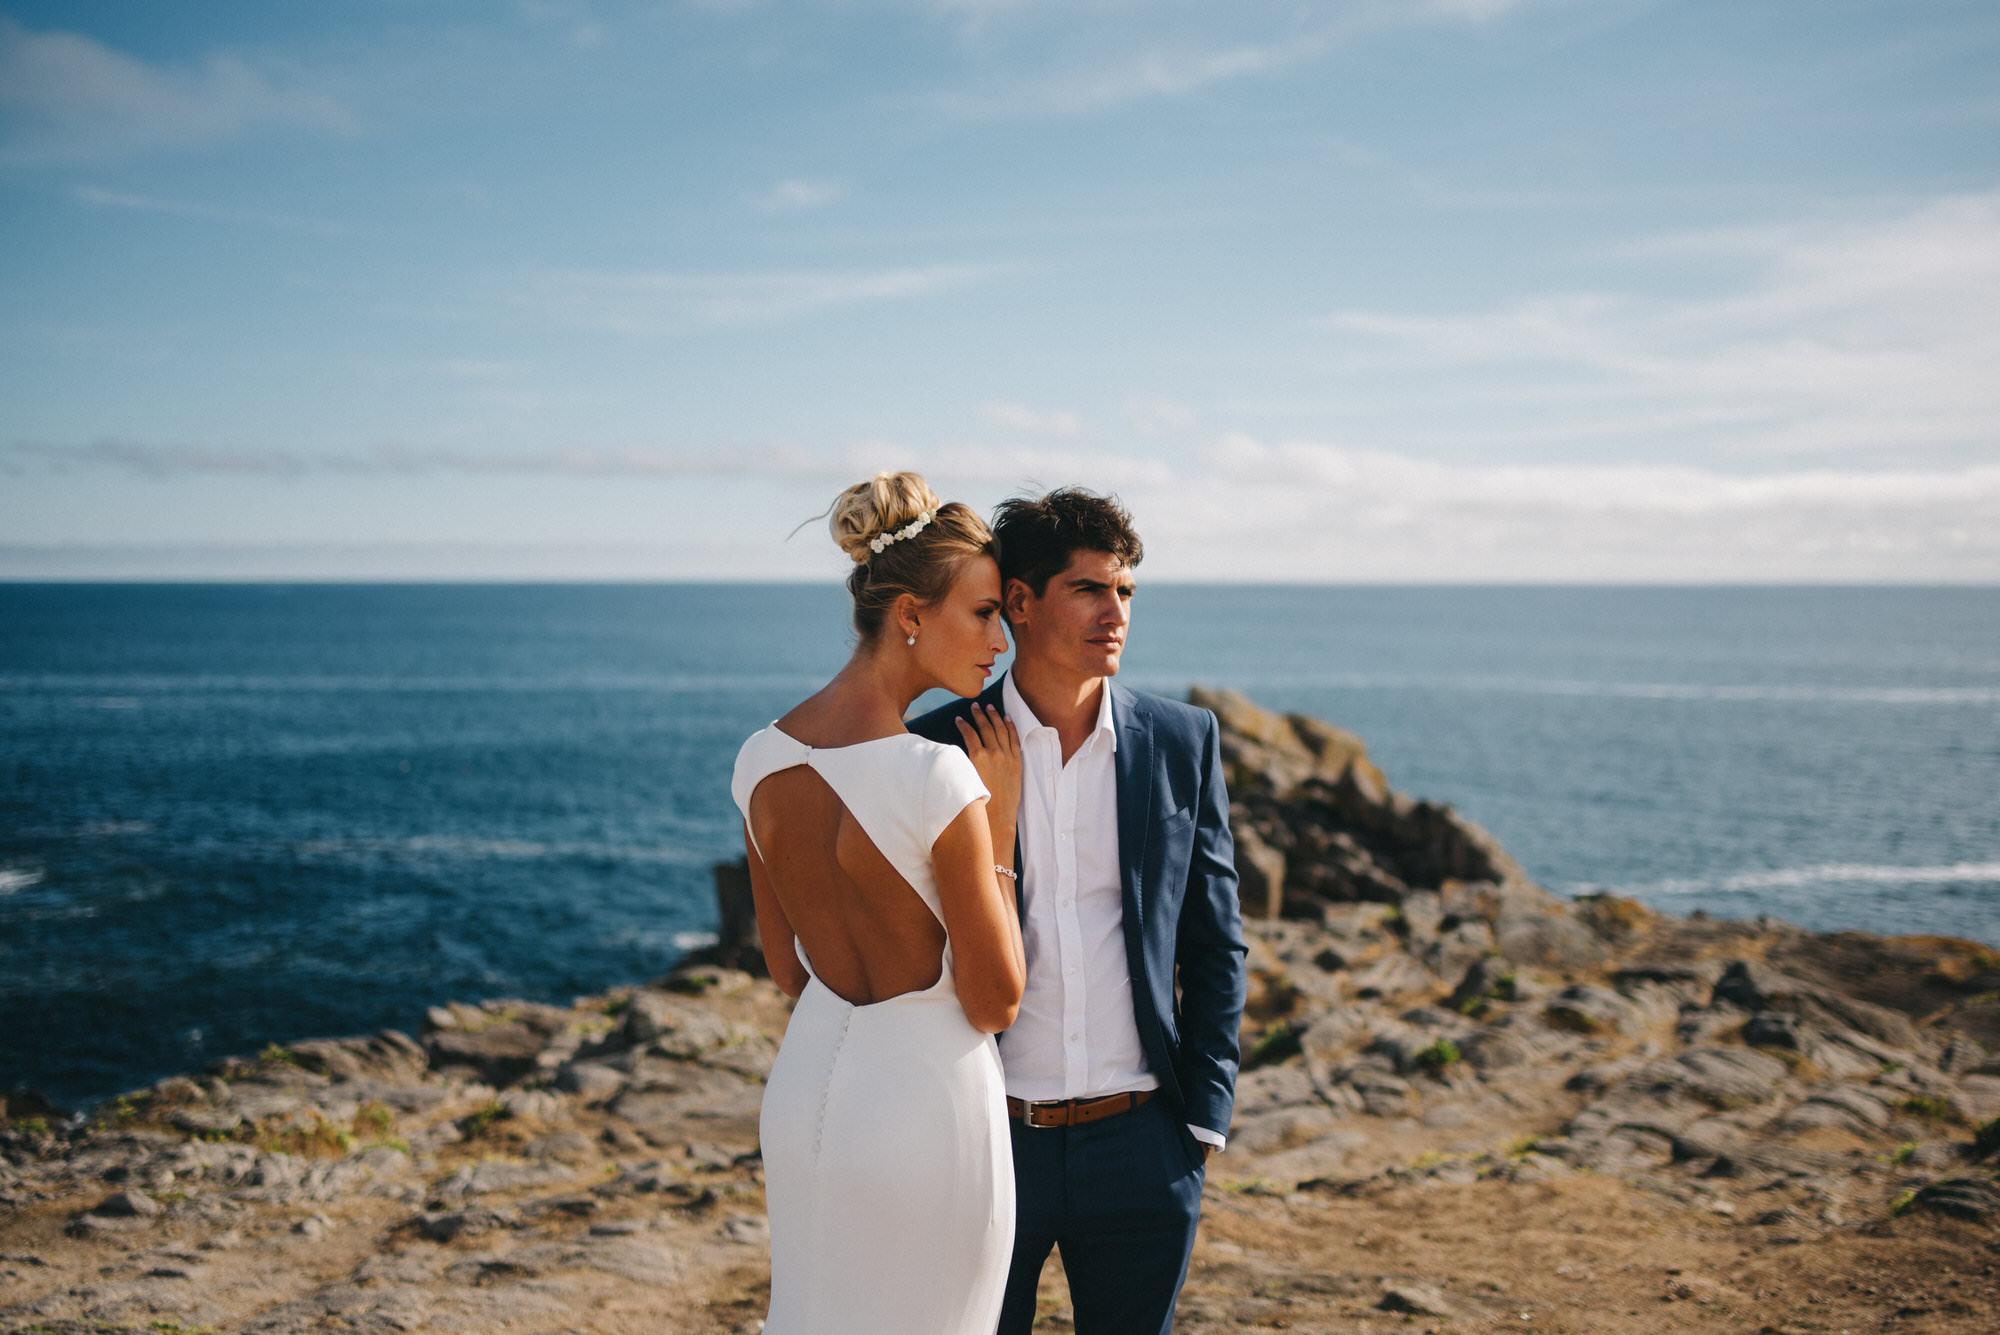 photographe-mariage-ile-d-yeu-00052